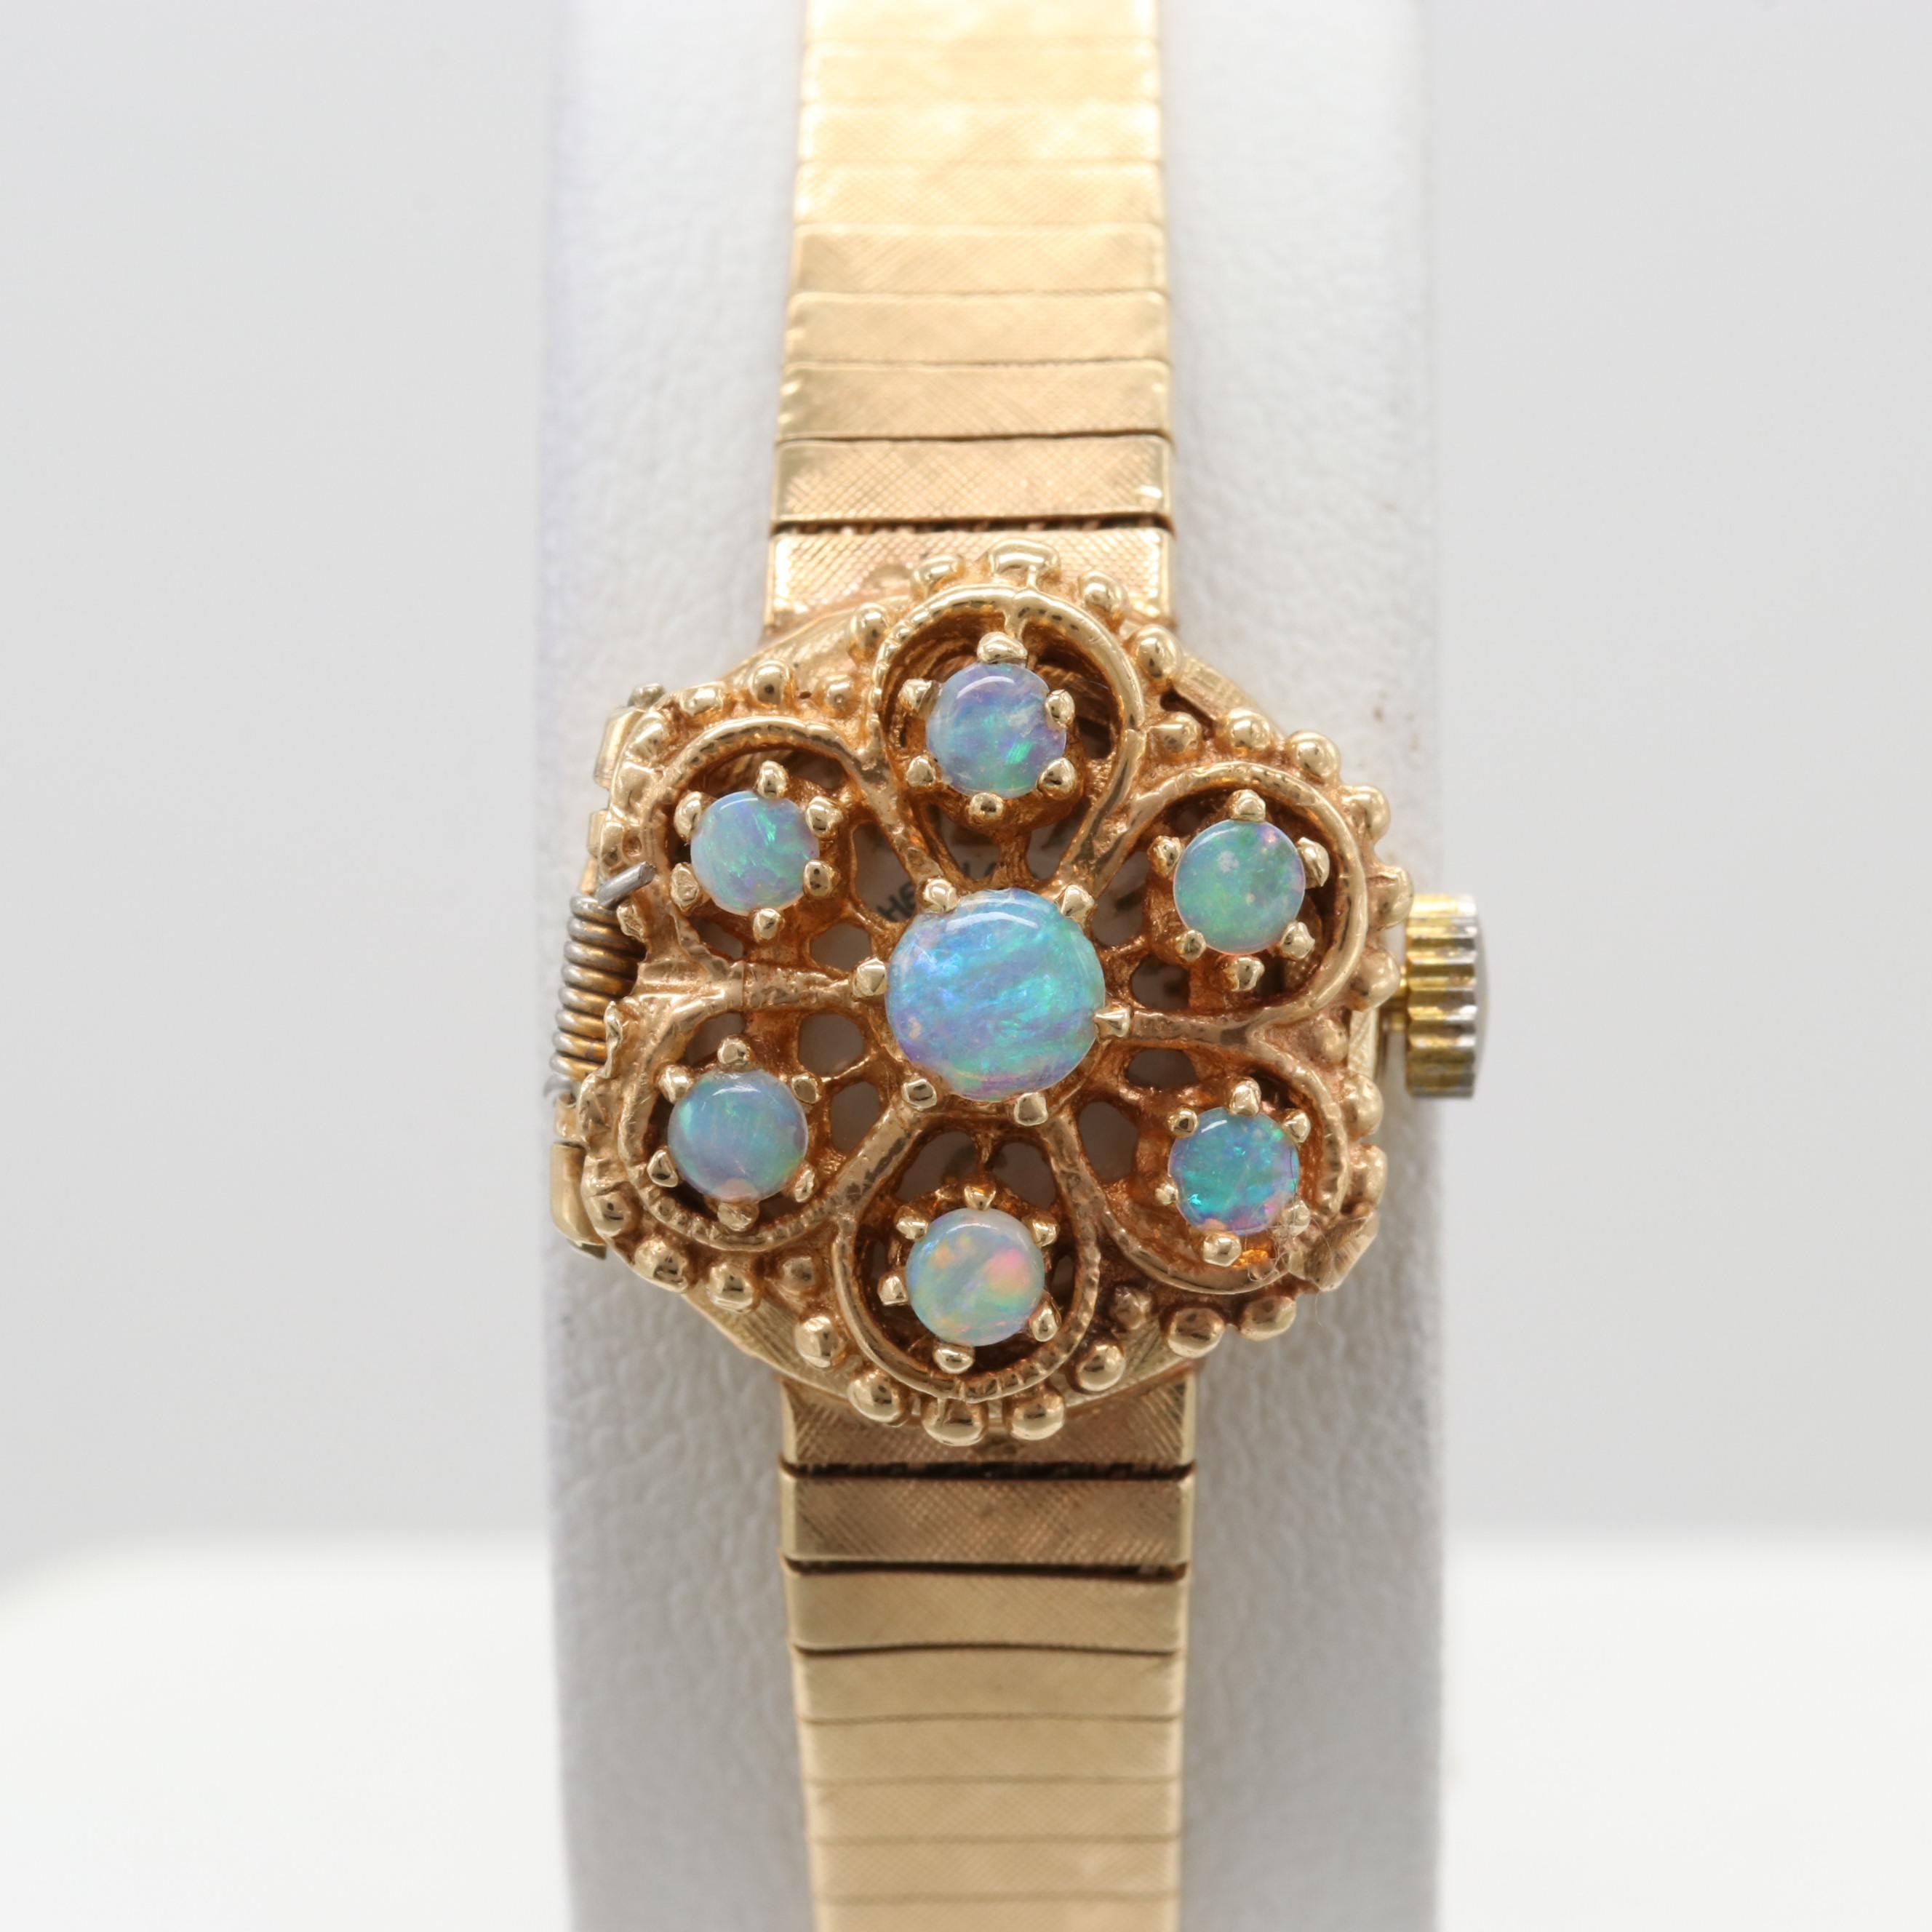 Heirloom 14K Yellow Gold Opal Stem Wind Wristwatch With Hidden Dial